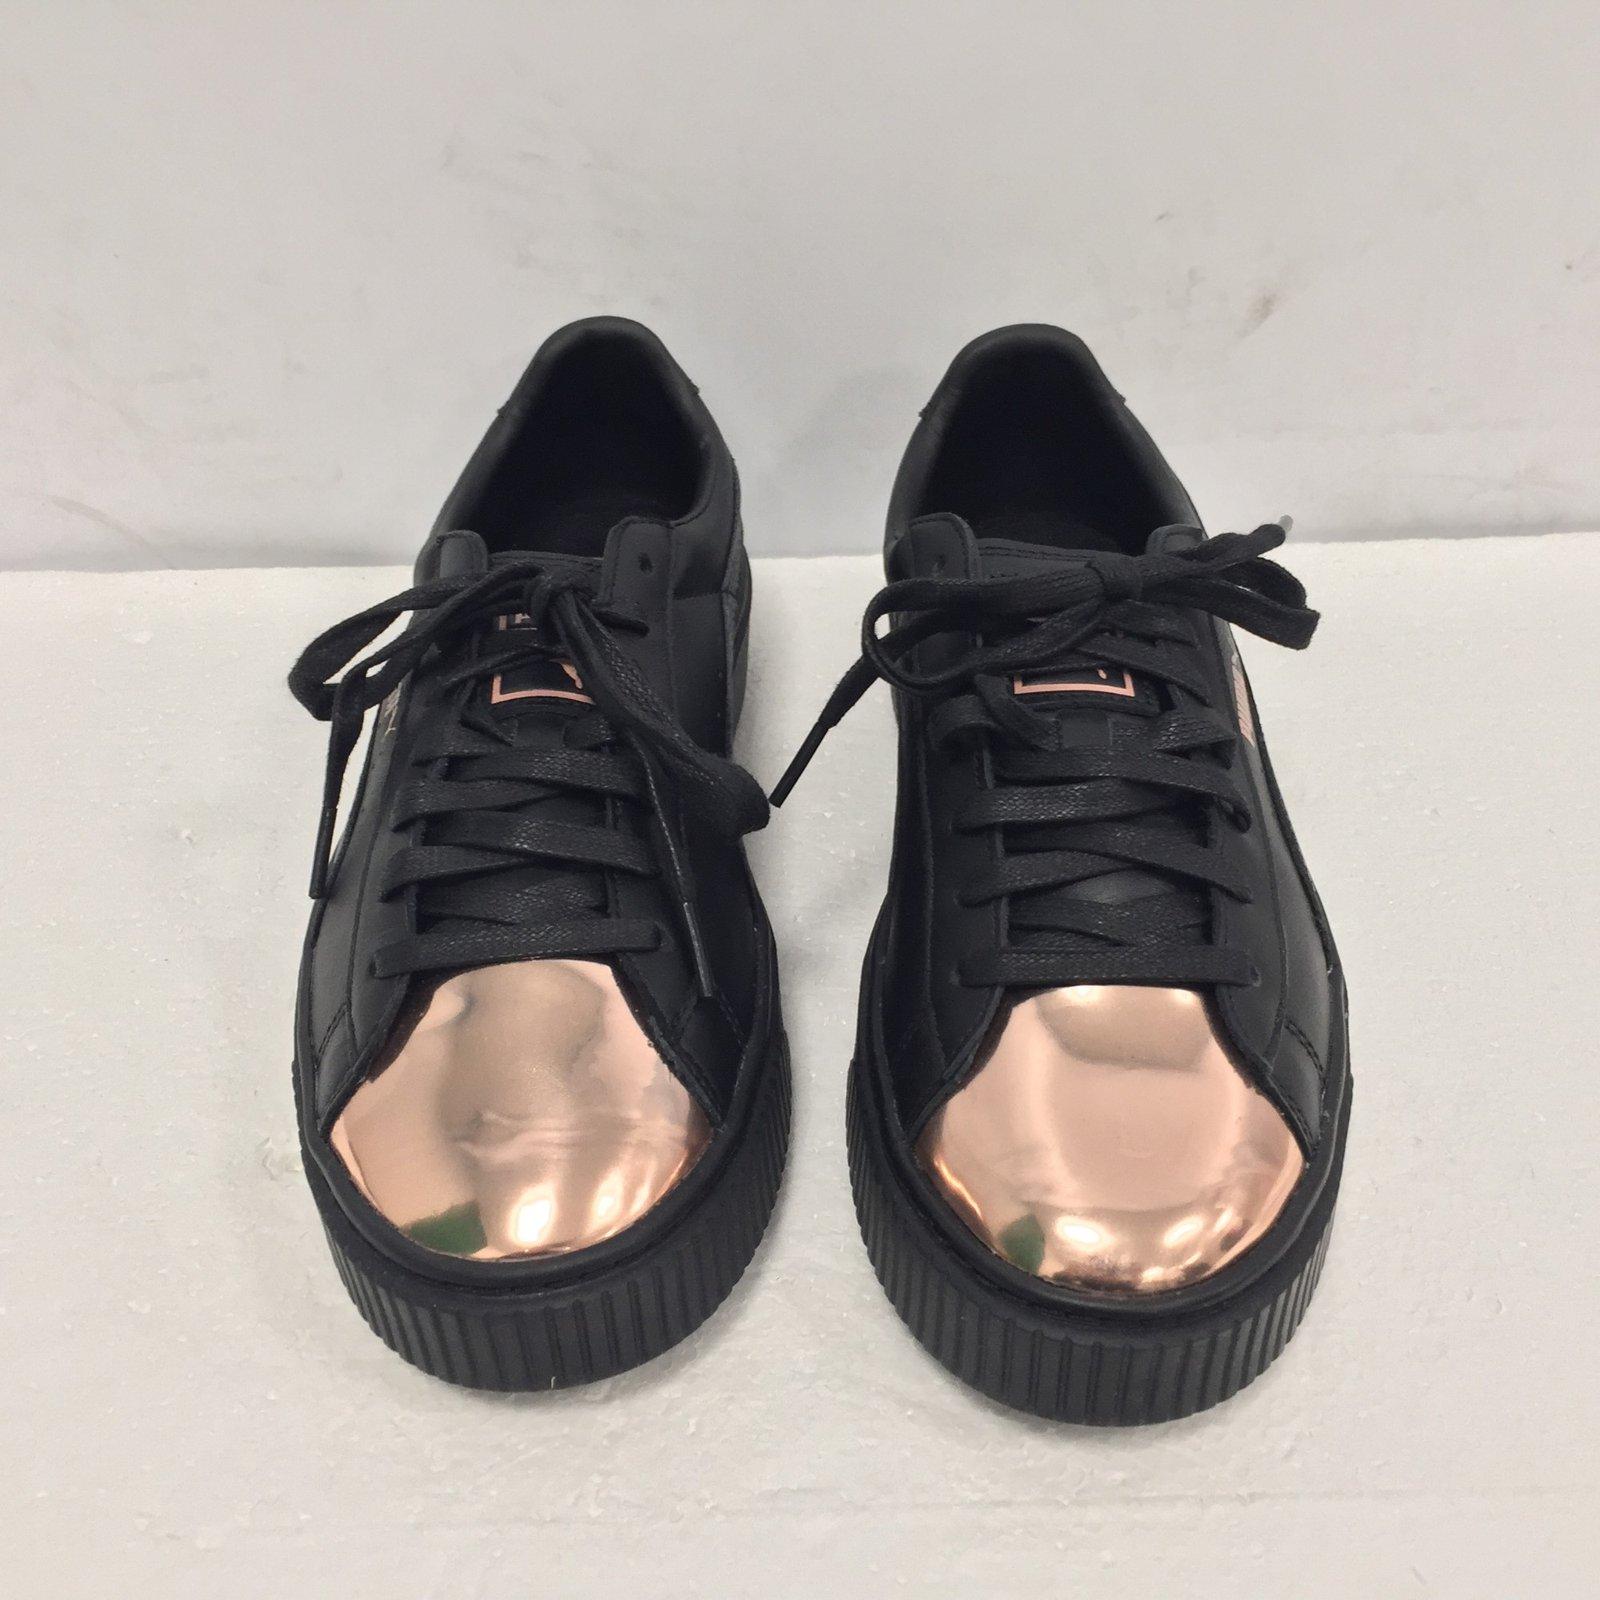 a01b6ee6e2c Puma Sneakers Sneakers Leather Black ref.65394 - Joli Closet